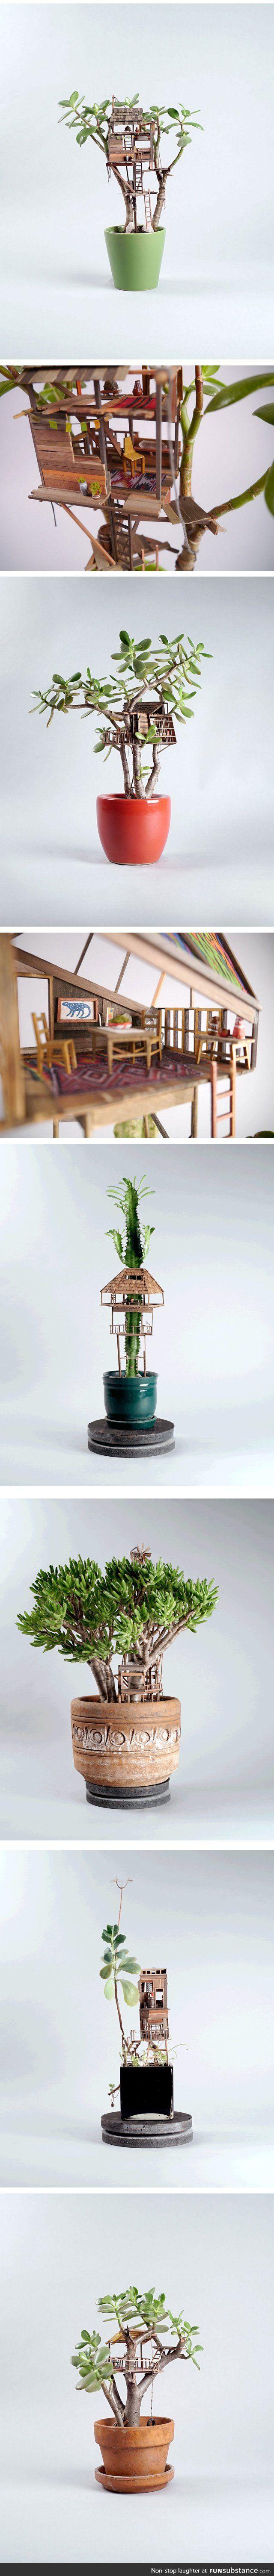 Miniature Tree Houses Make Houseplants Way More Interesting